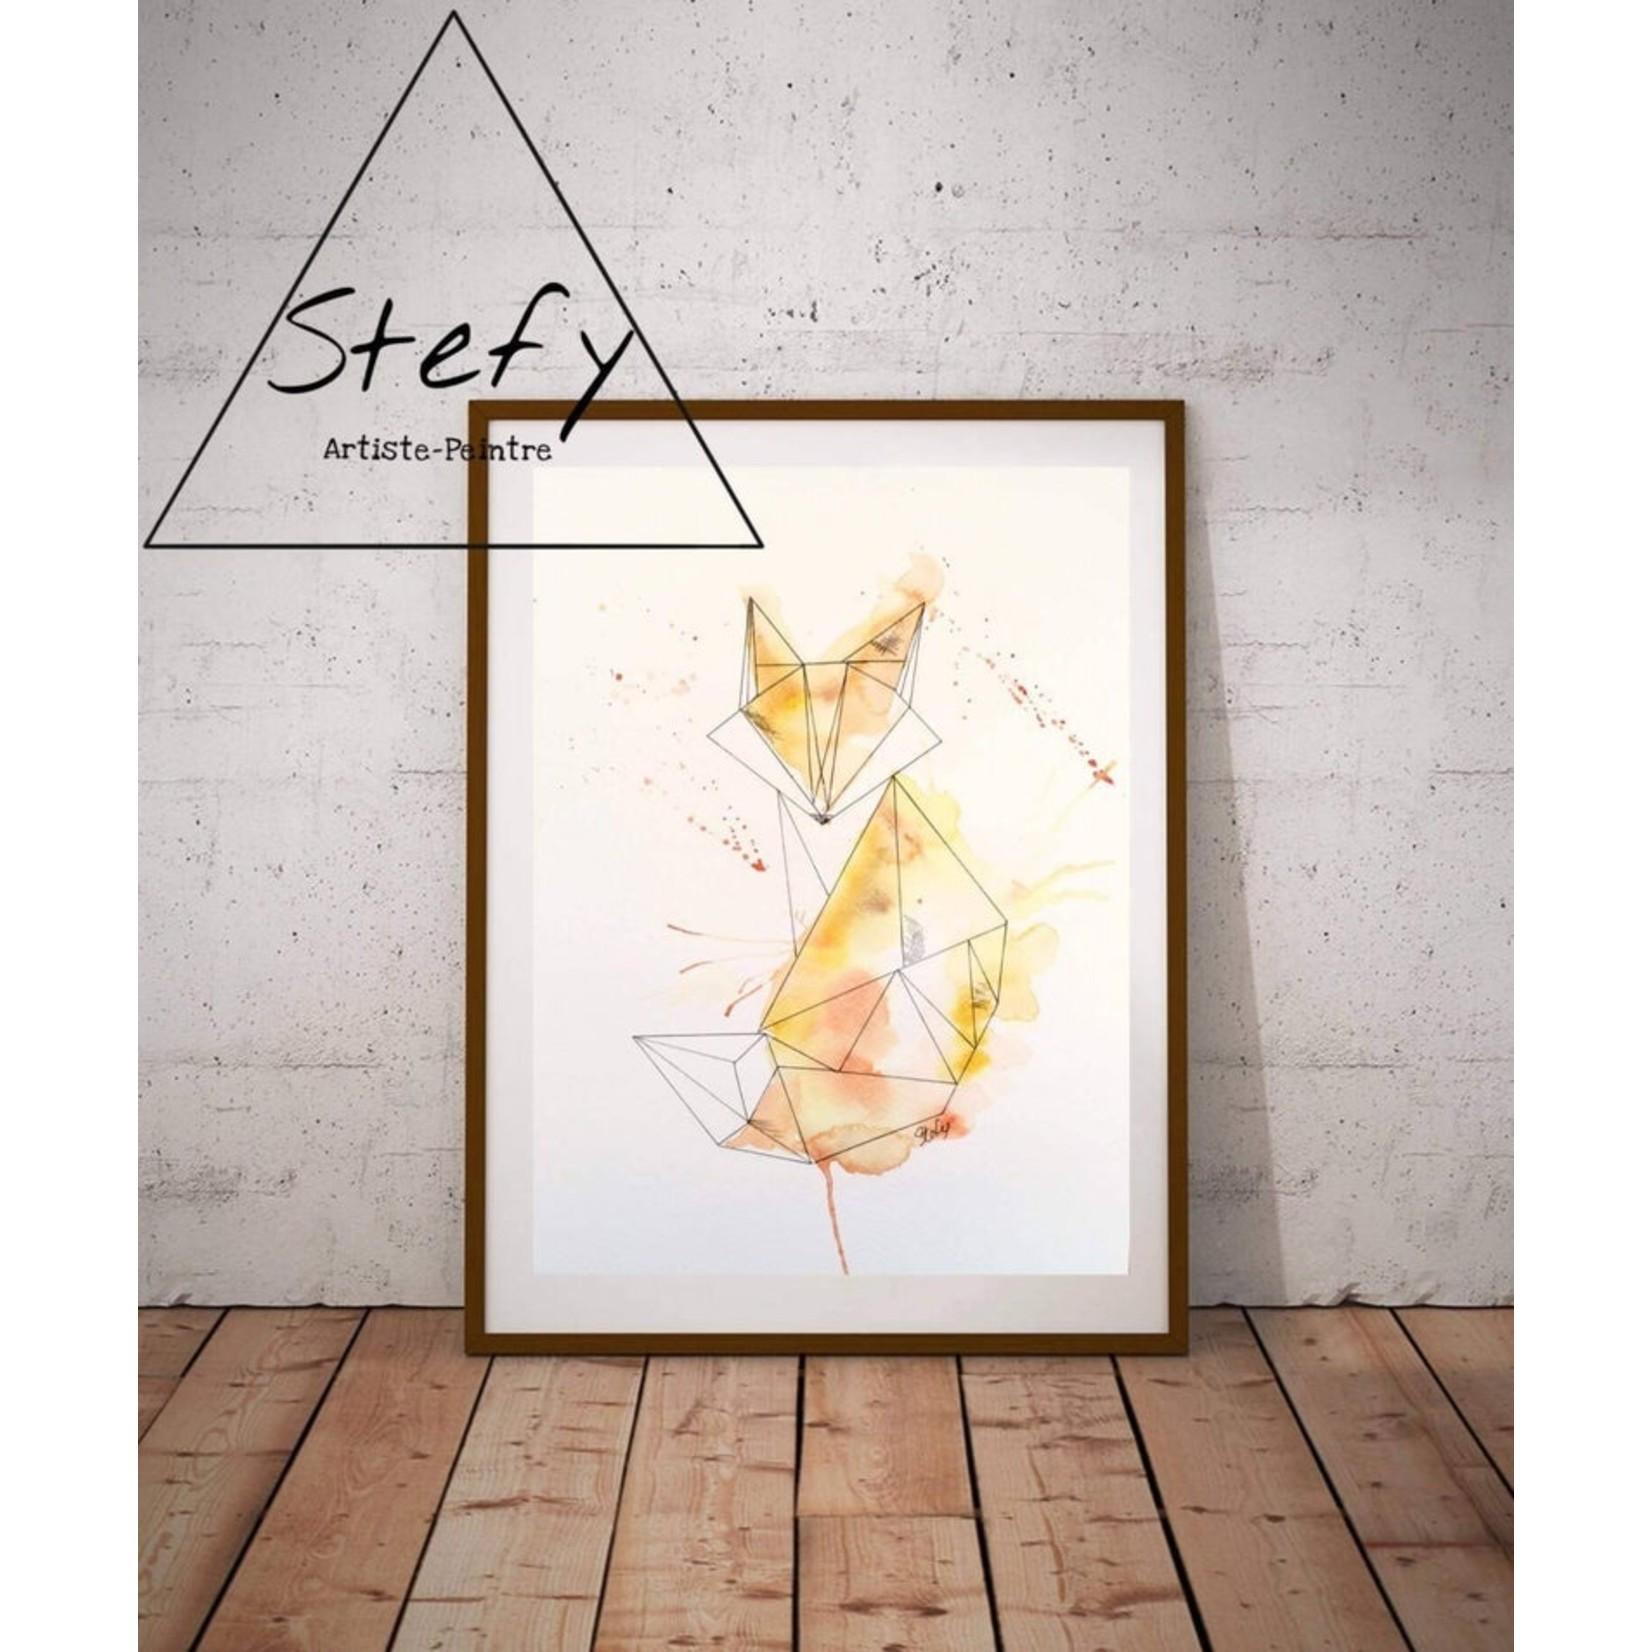 Stefy Artist || Illustration Renard  1